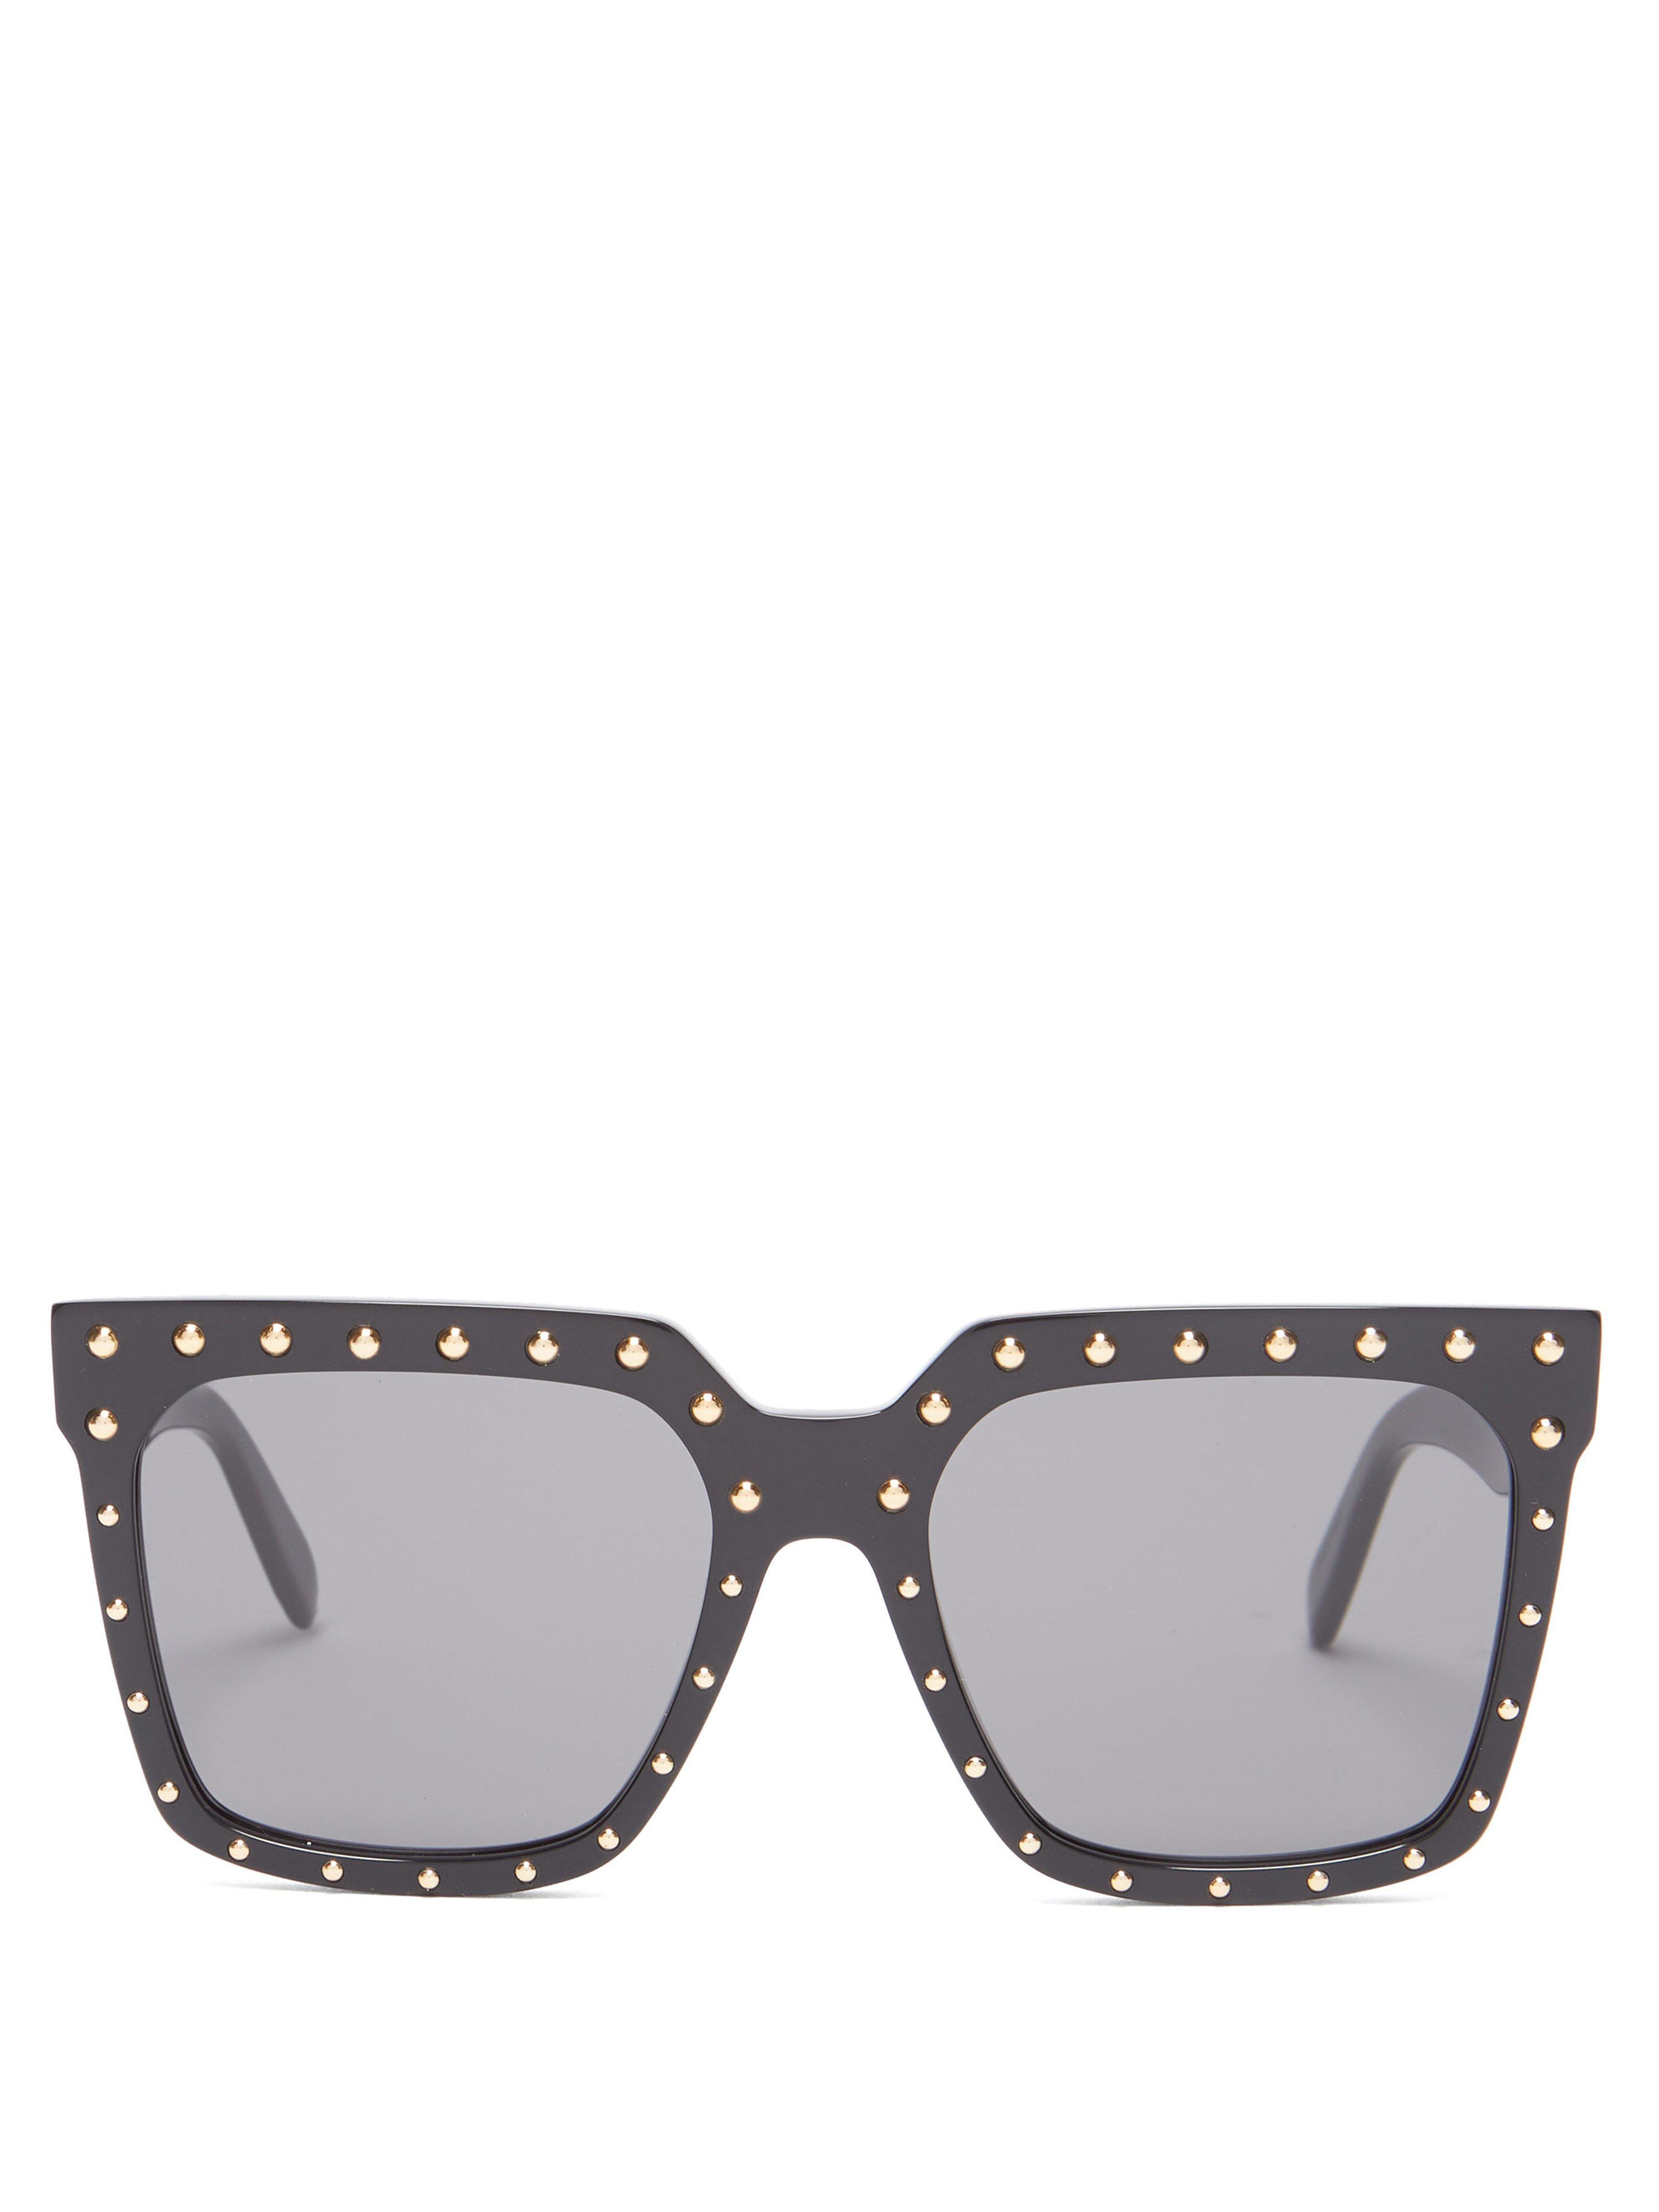 a03adf14bf Céline - Black Stud Embellished Square Frame Acetate Sunglasses - Lyst.  View fullscreen